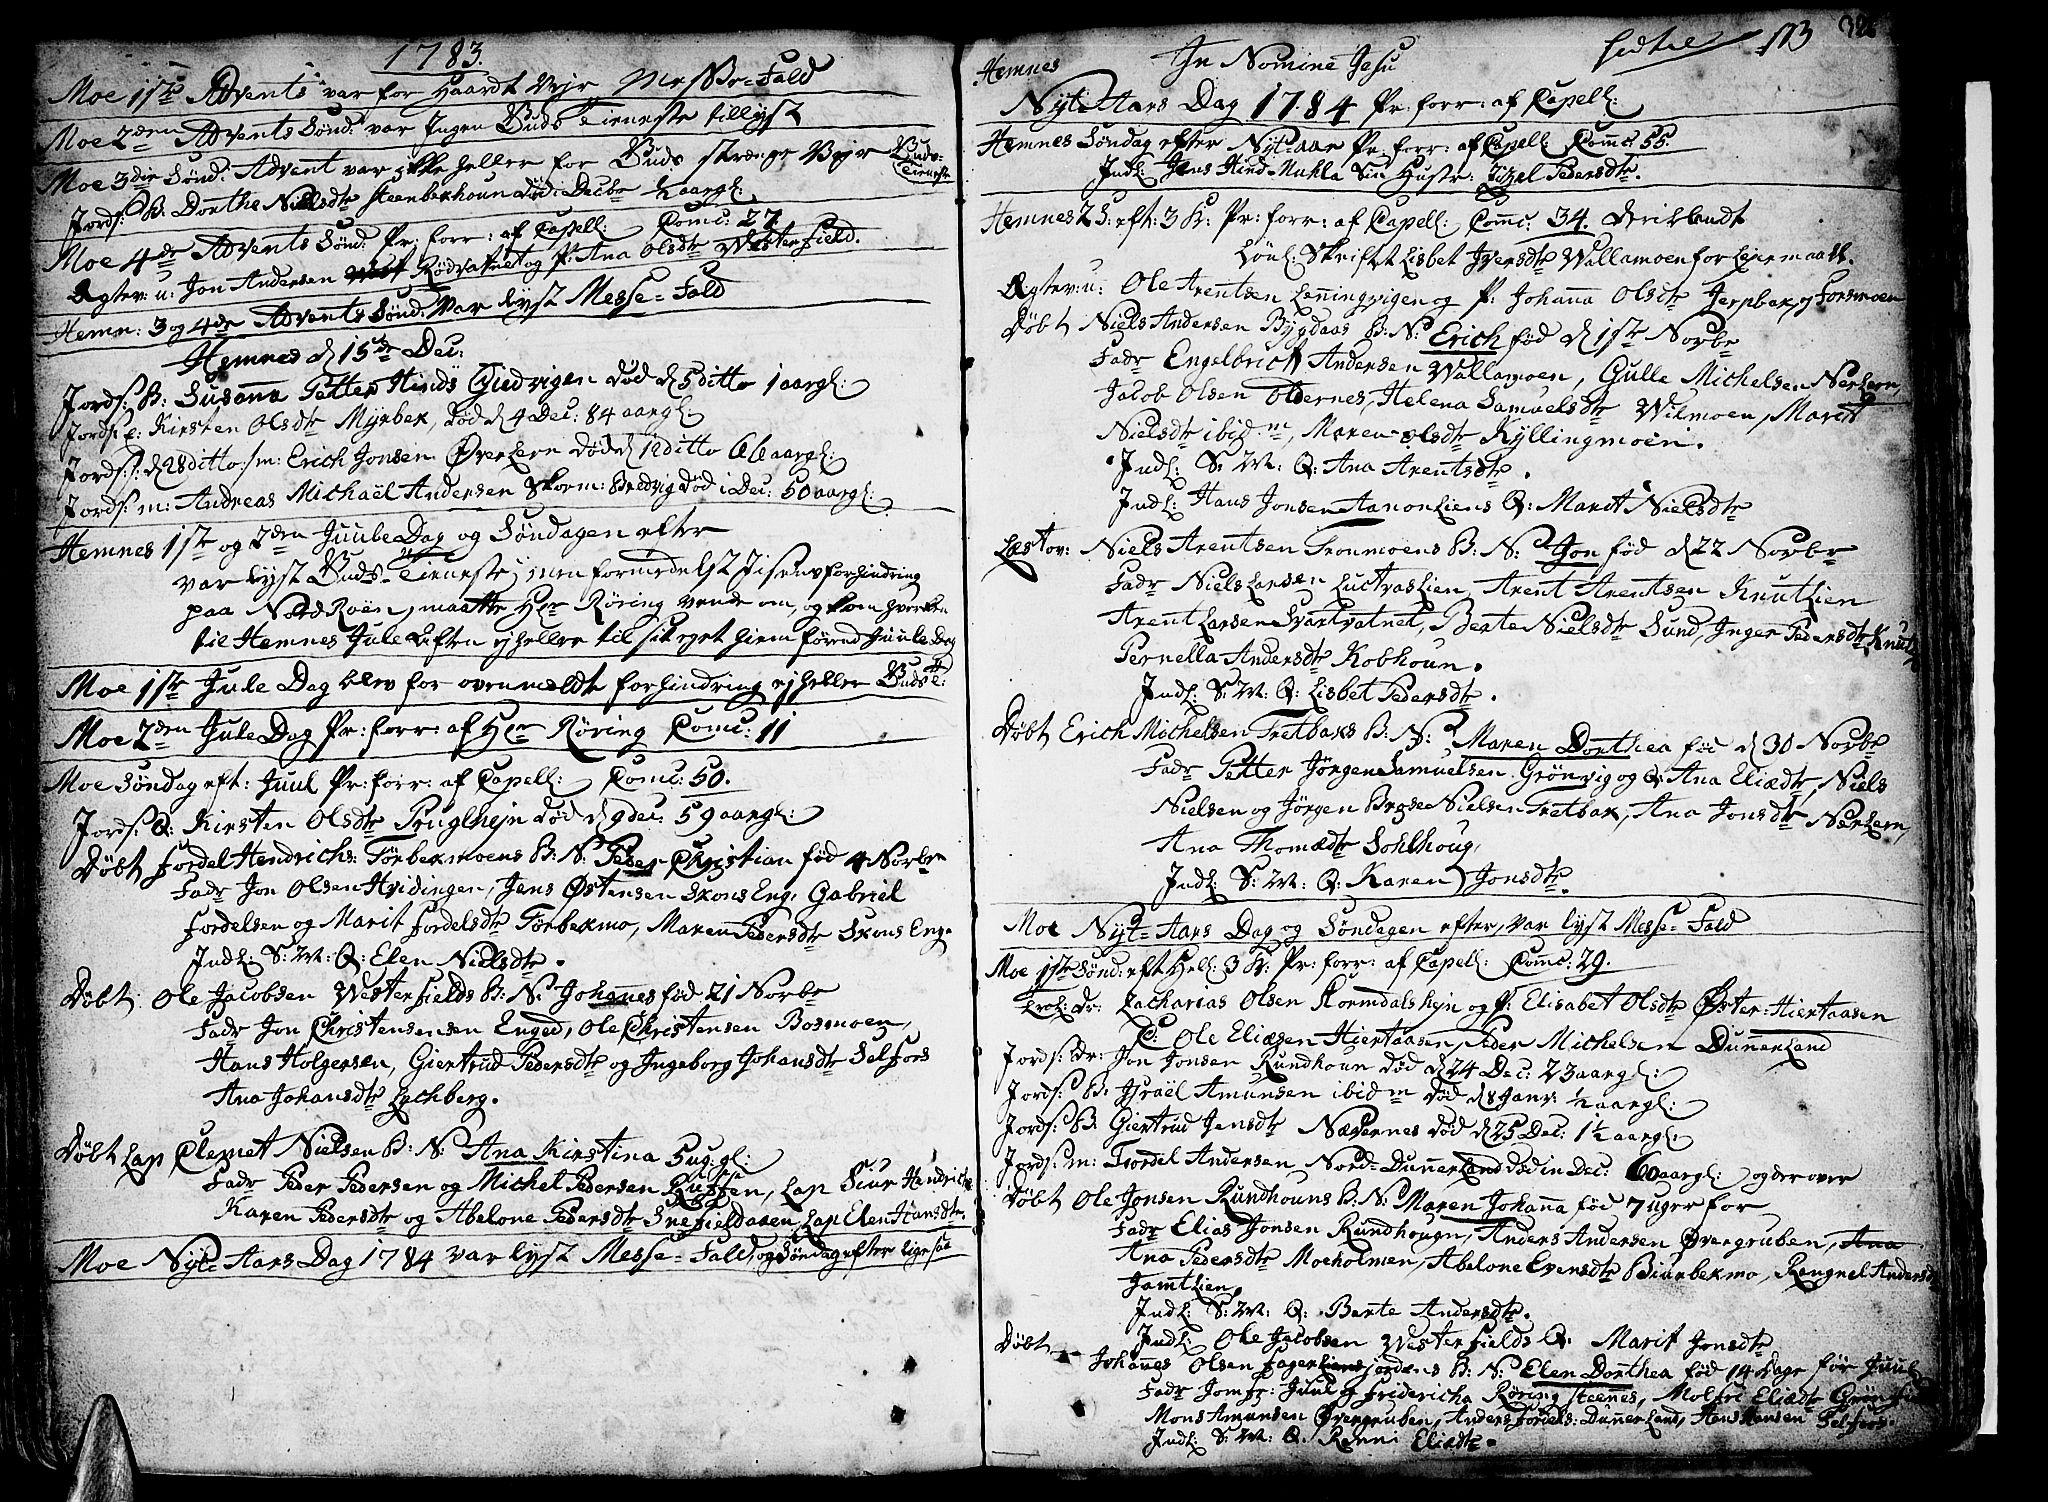 SAT, Ministerialprotokoller, klokkerbøker og fødselsregistre - Nordland, 825/L0348: Ministerialbok nr. 825A04, 1752-1788, s. 326